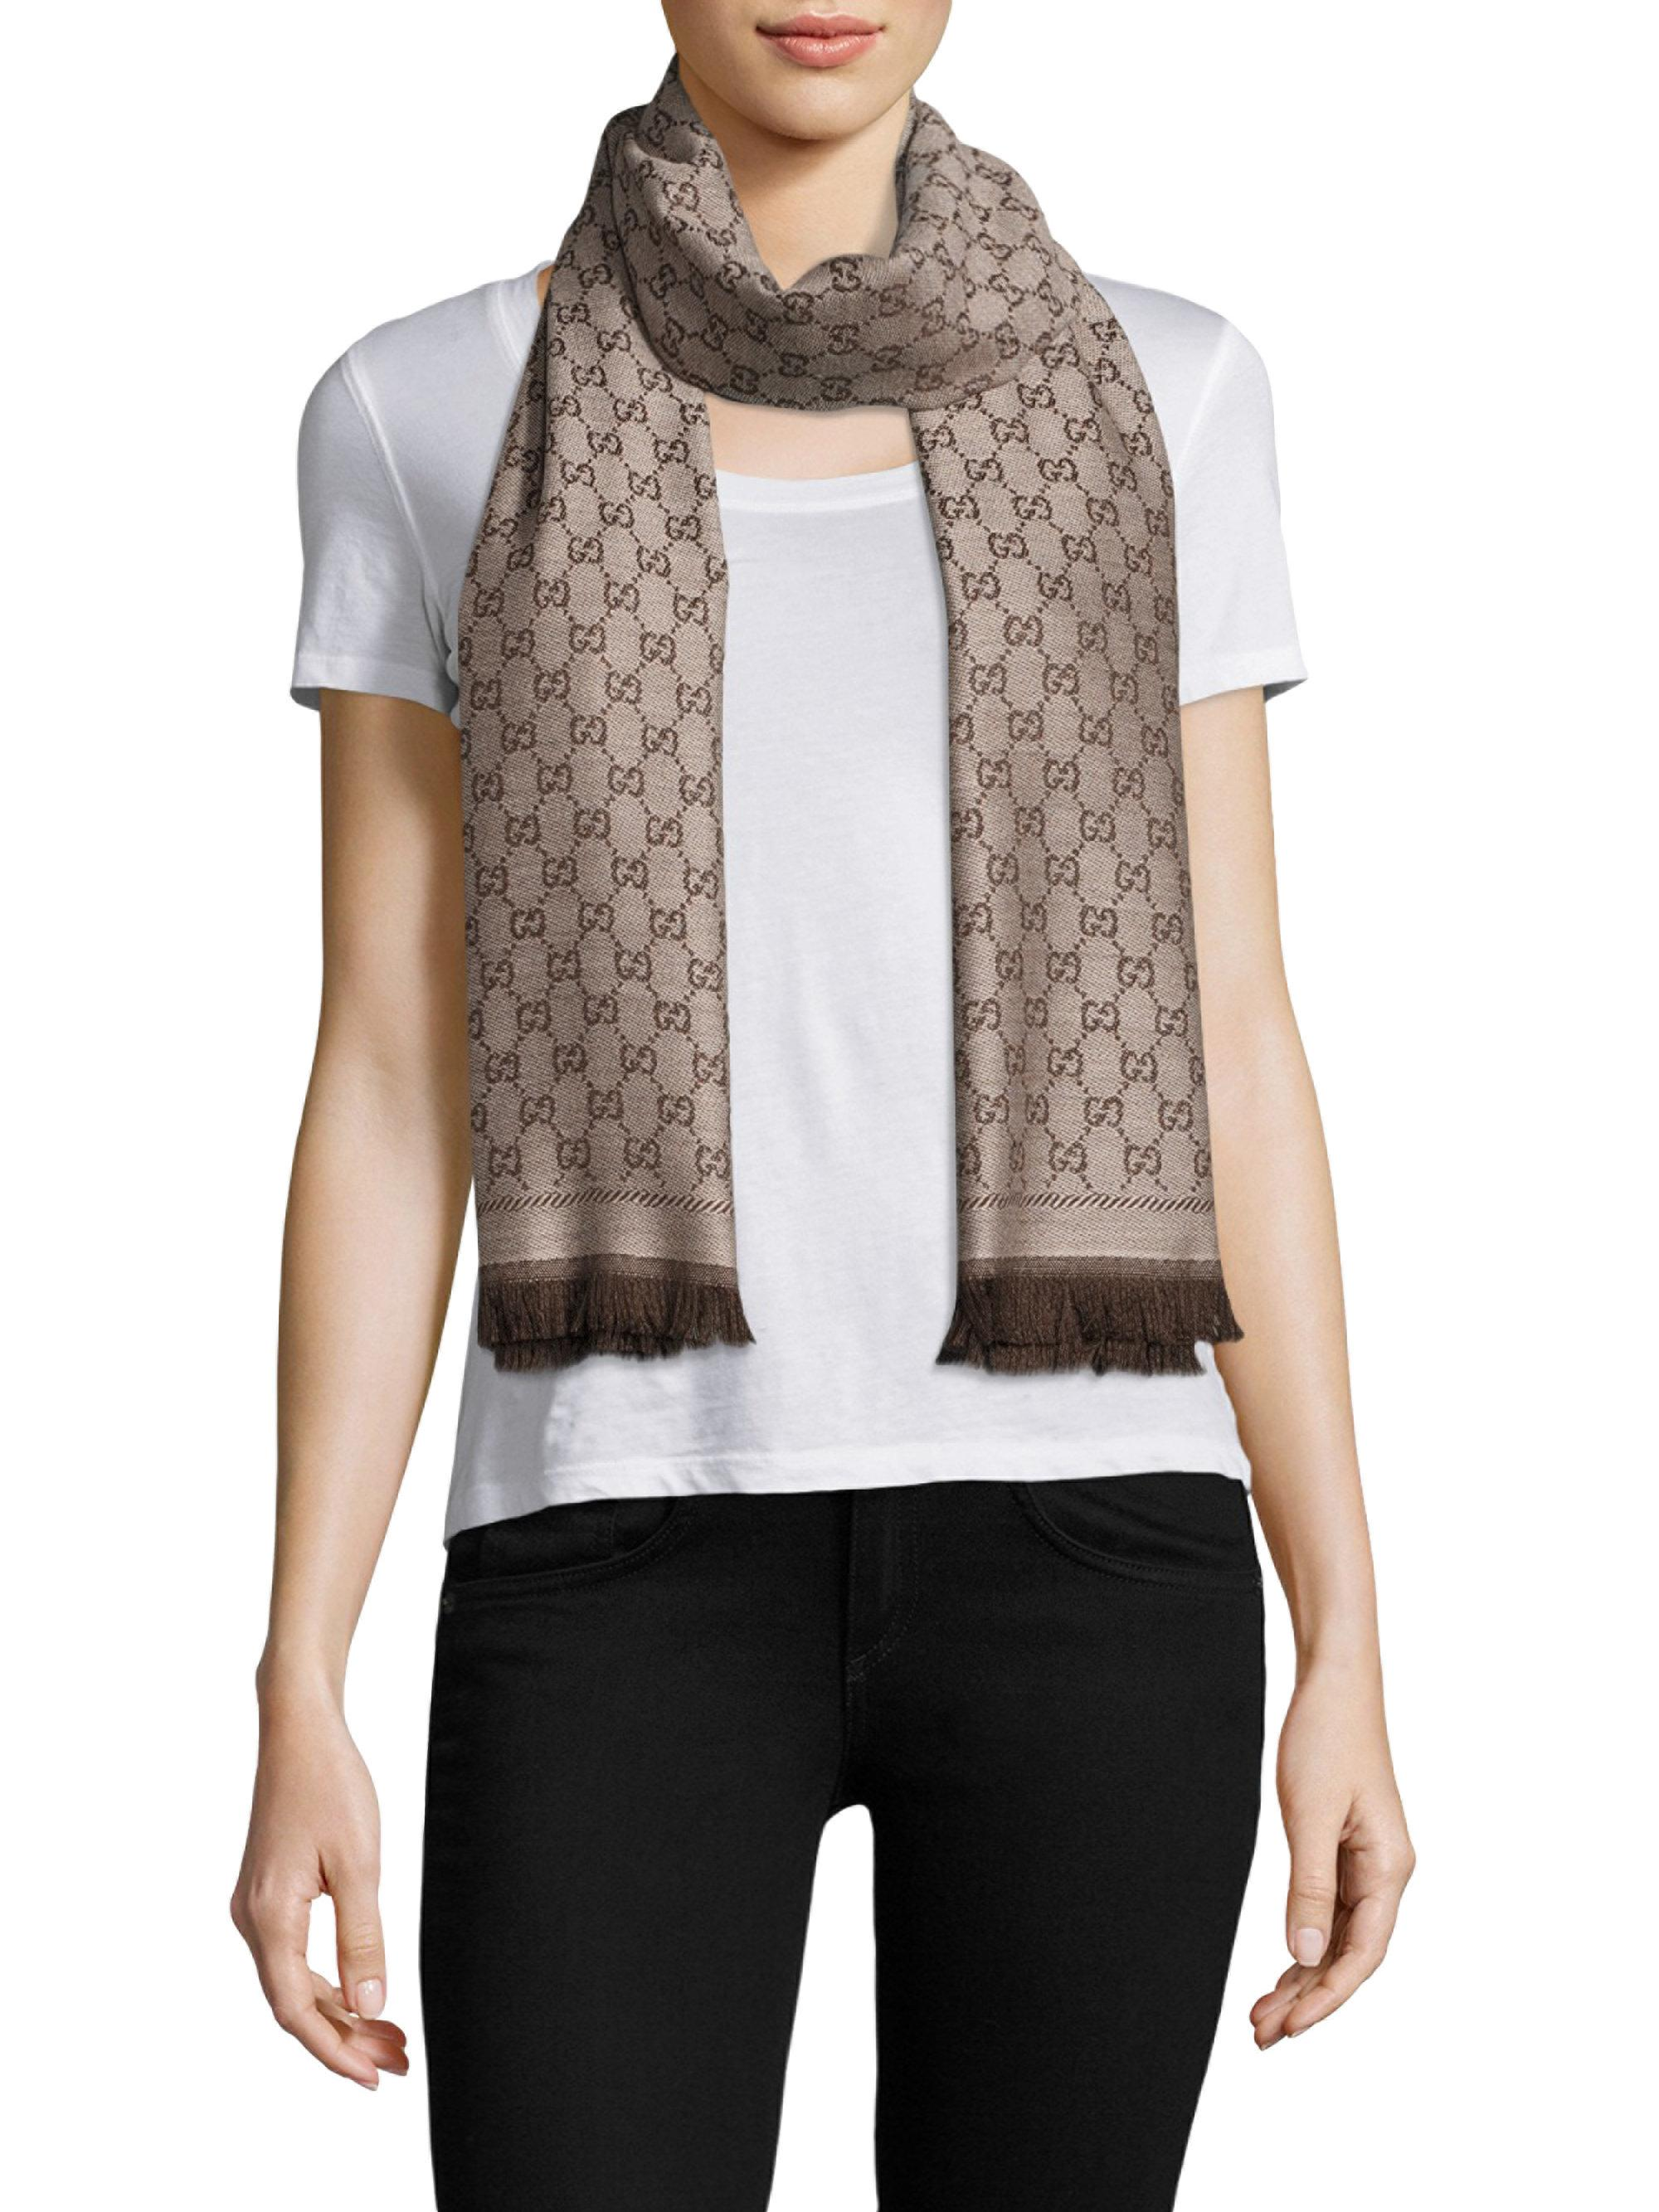 lyst issey gallery franco madame in scarf miyake ferrari black please accessories t pleats pleated